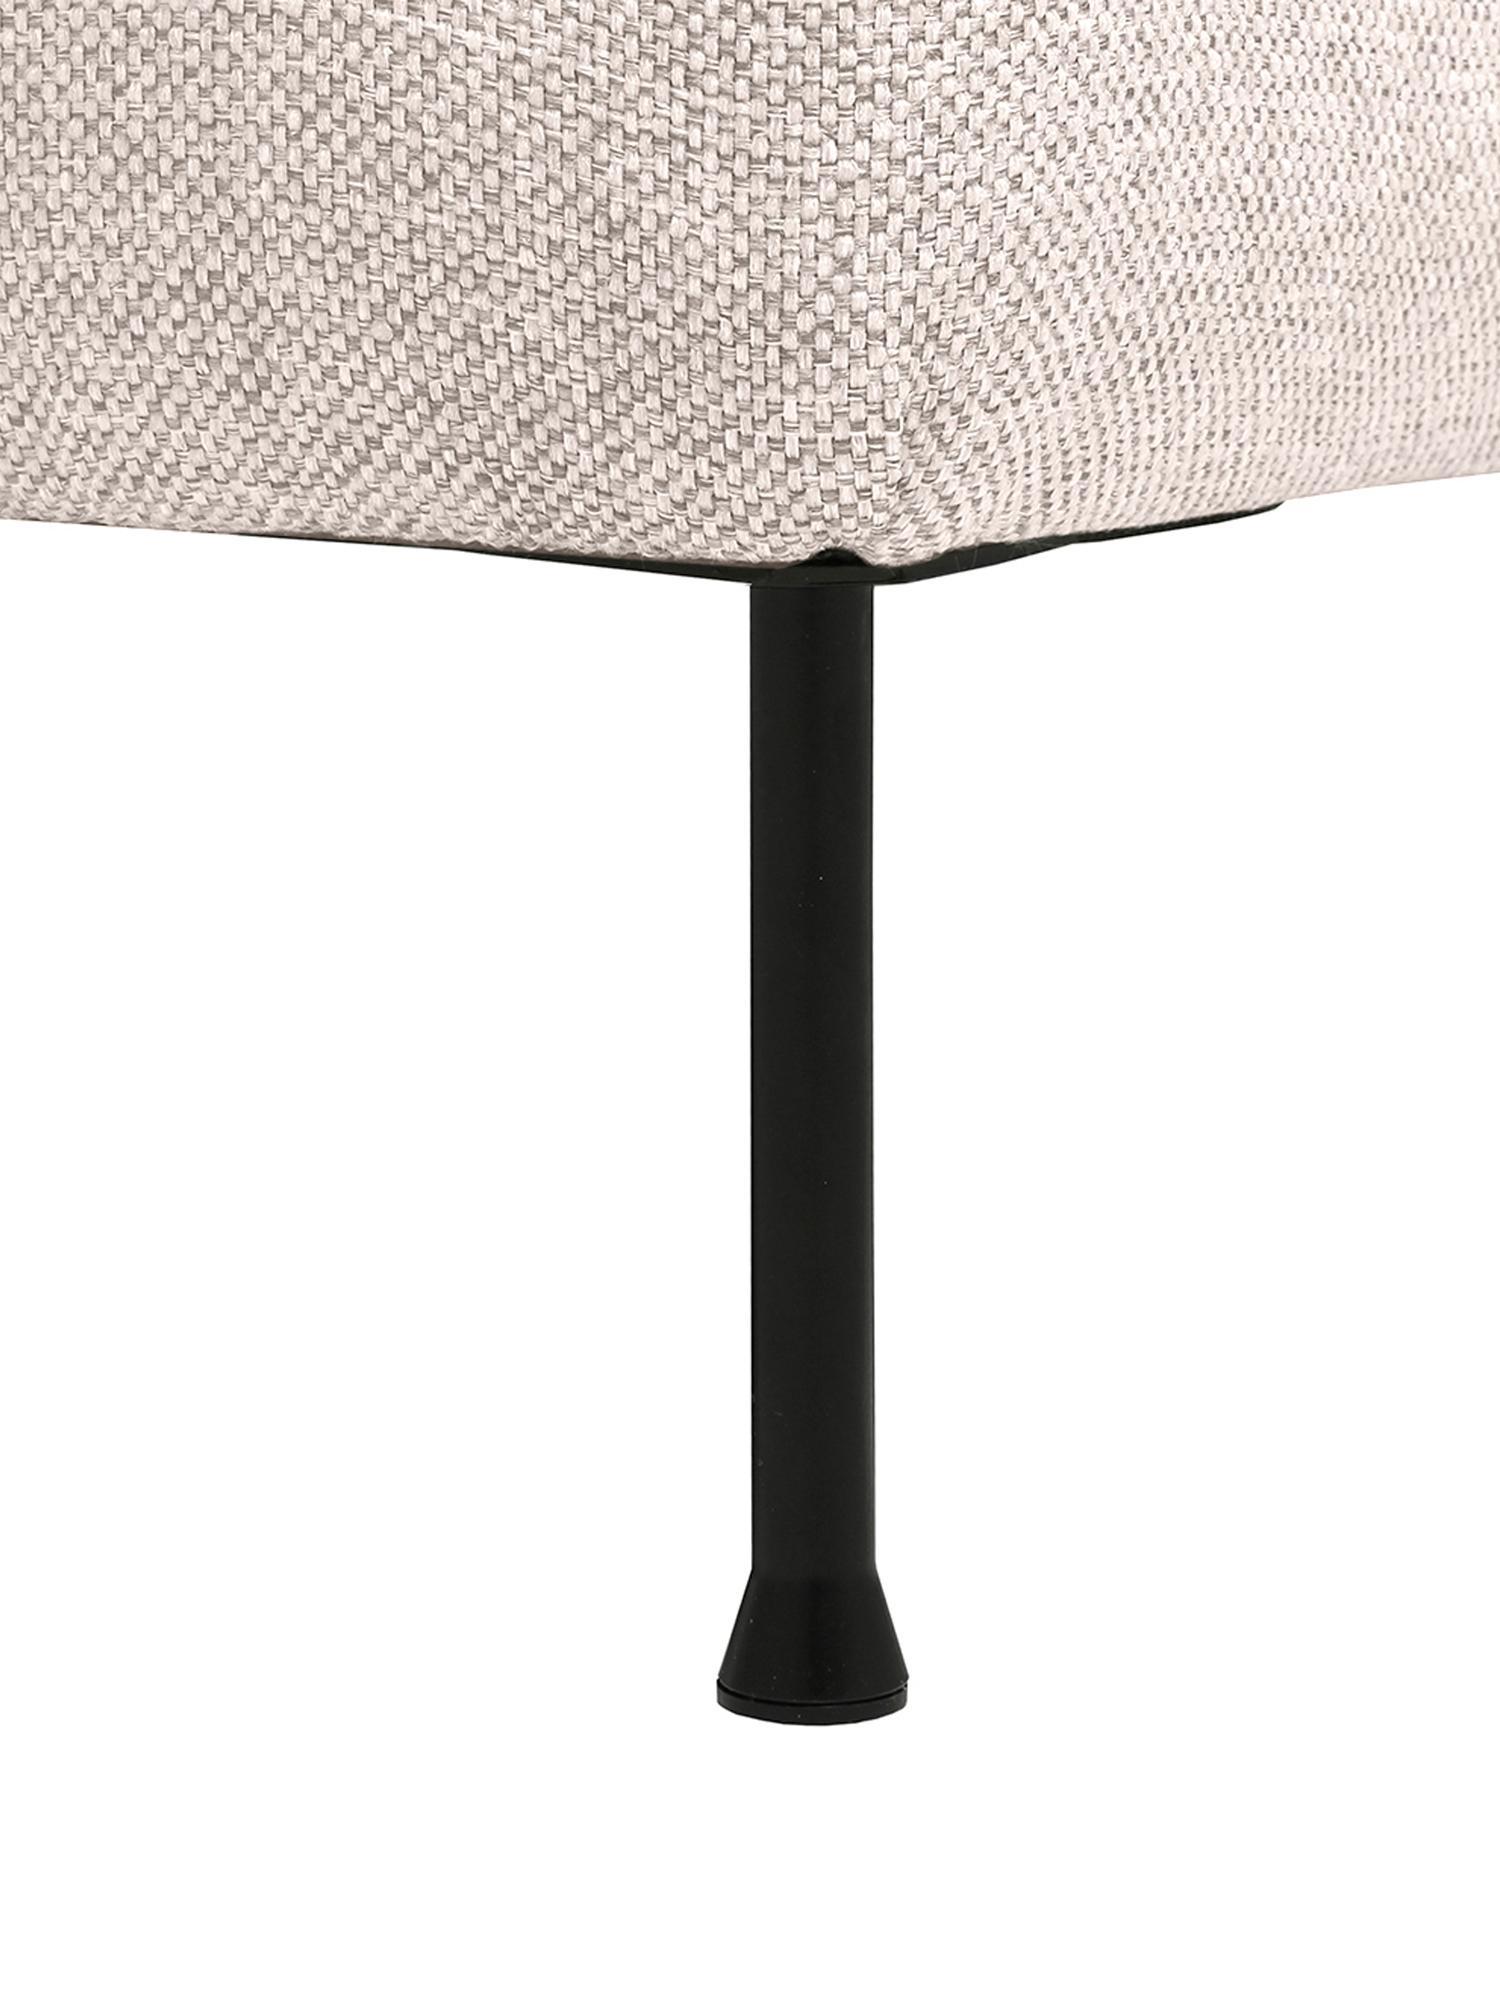 Hoekbank Cucita (3-zits), Bekleding: geweven stof (polyester), Frame: massief grenenhout, Poten: gelakt metaal, Geweven stof beige, B 262 x D 163 cm